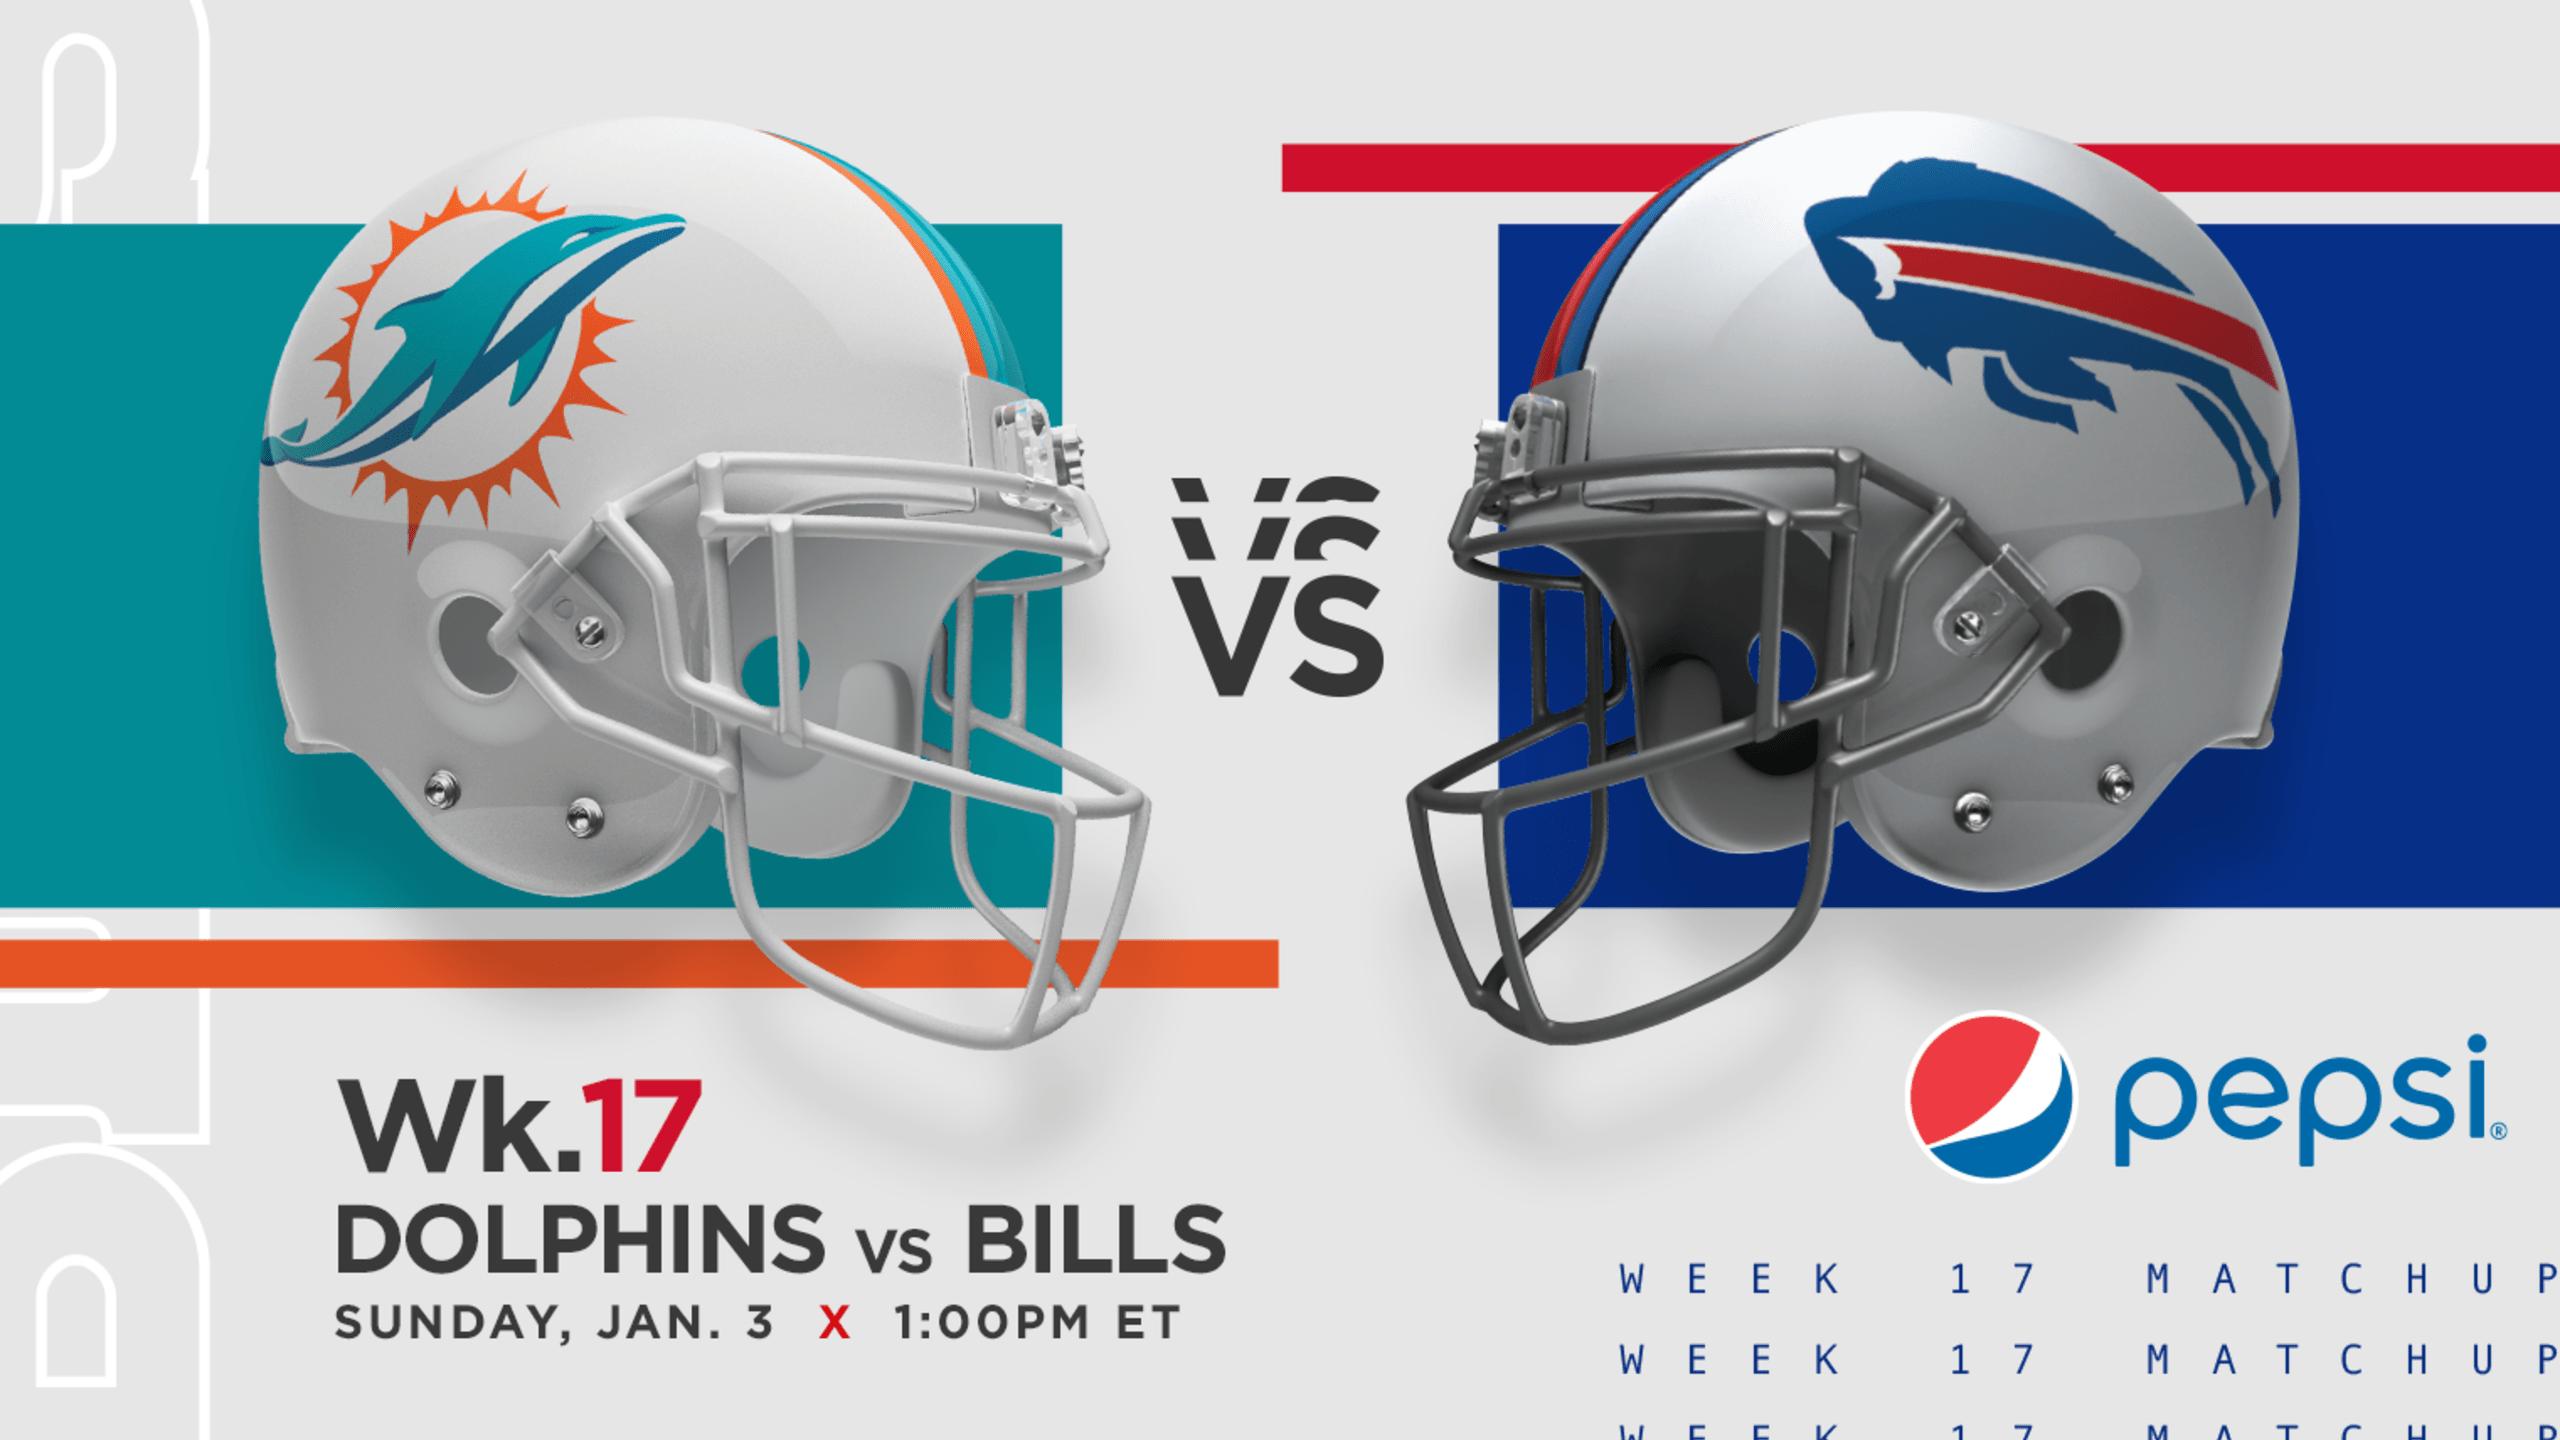 Pin By David Riekstins On Buffalo Bills In 2021 Buffalo Bills Nfl Buffalo Bills Bills